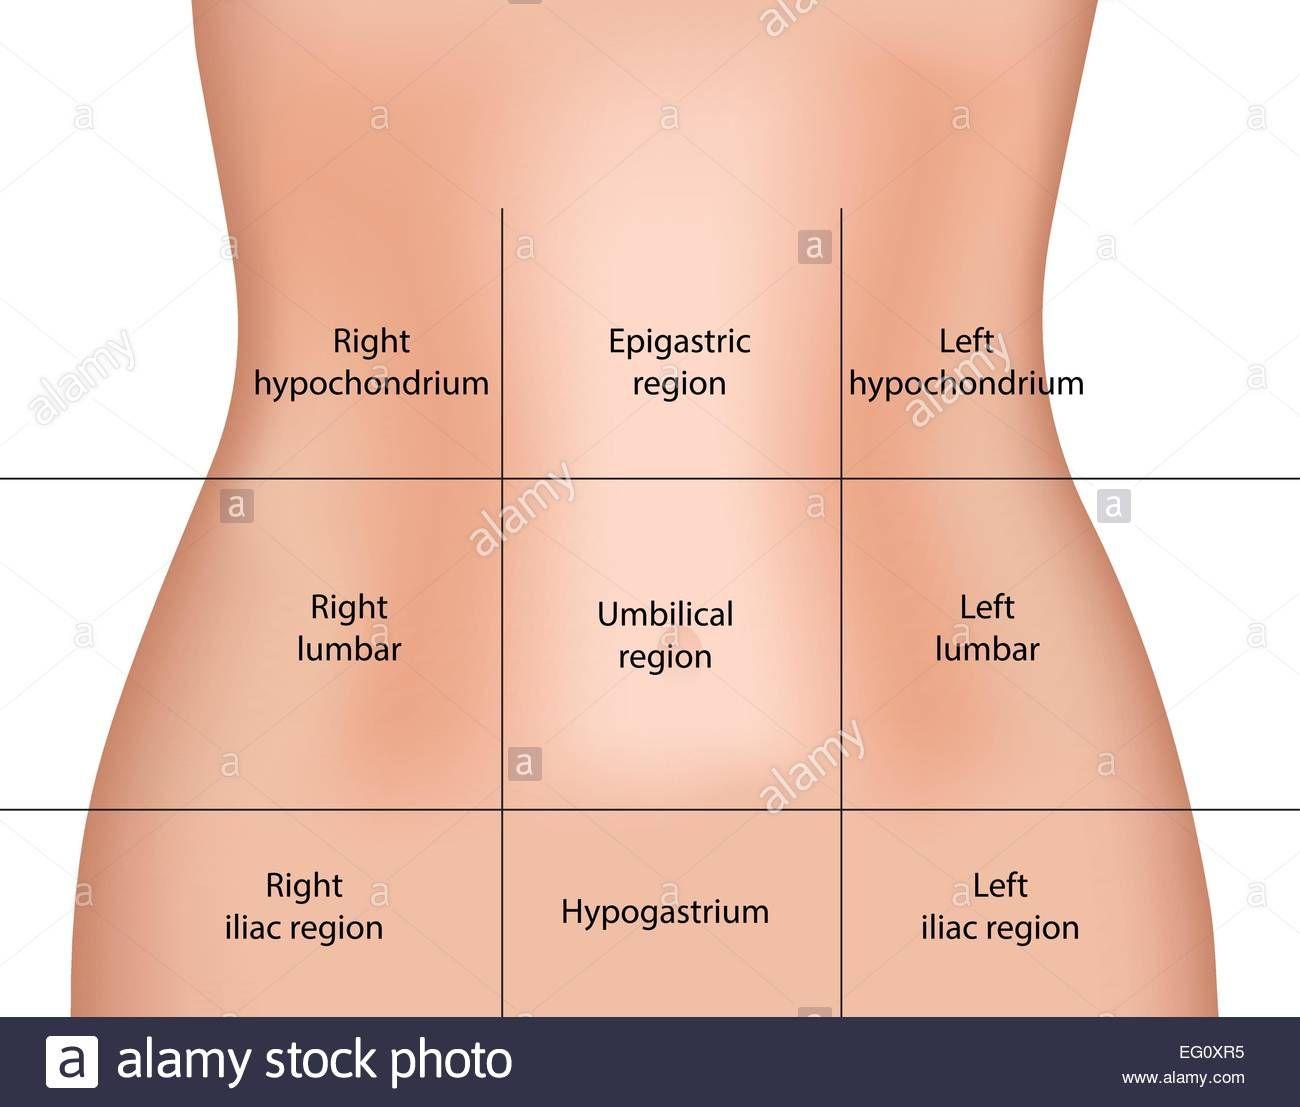 abdominal regions abdominal pain nurse practitioner med school nursing medicine breastfeeding [ 1300 x 1107 Pixel ]